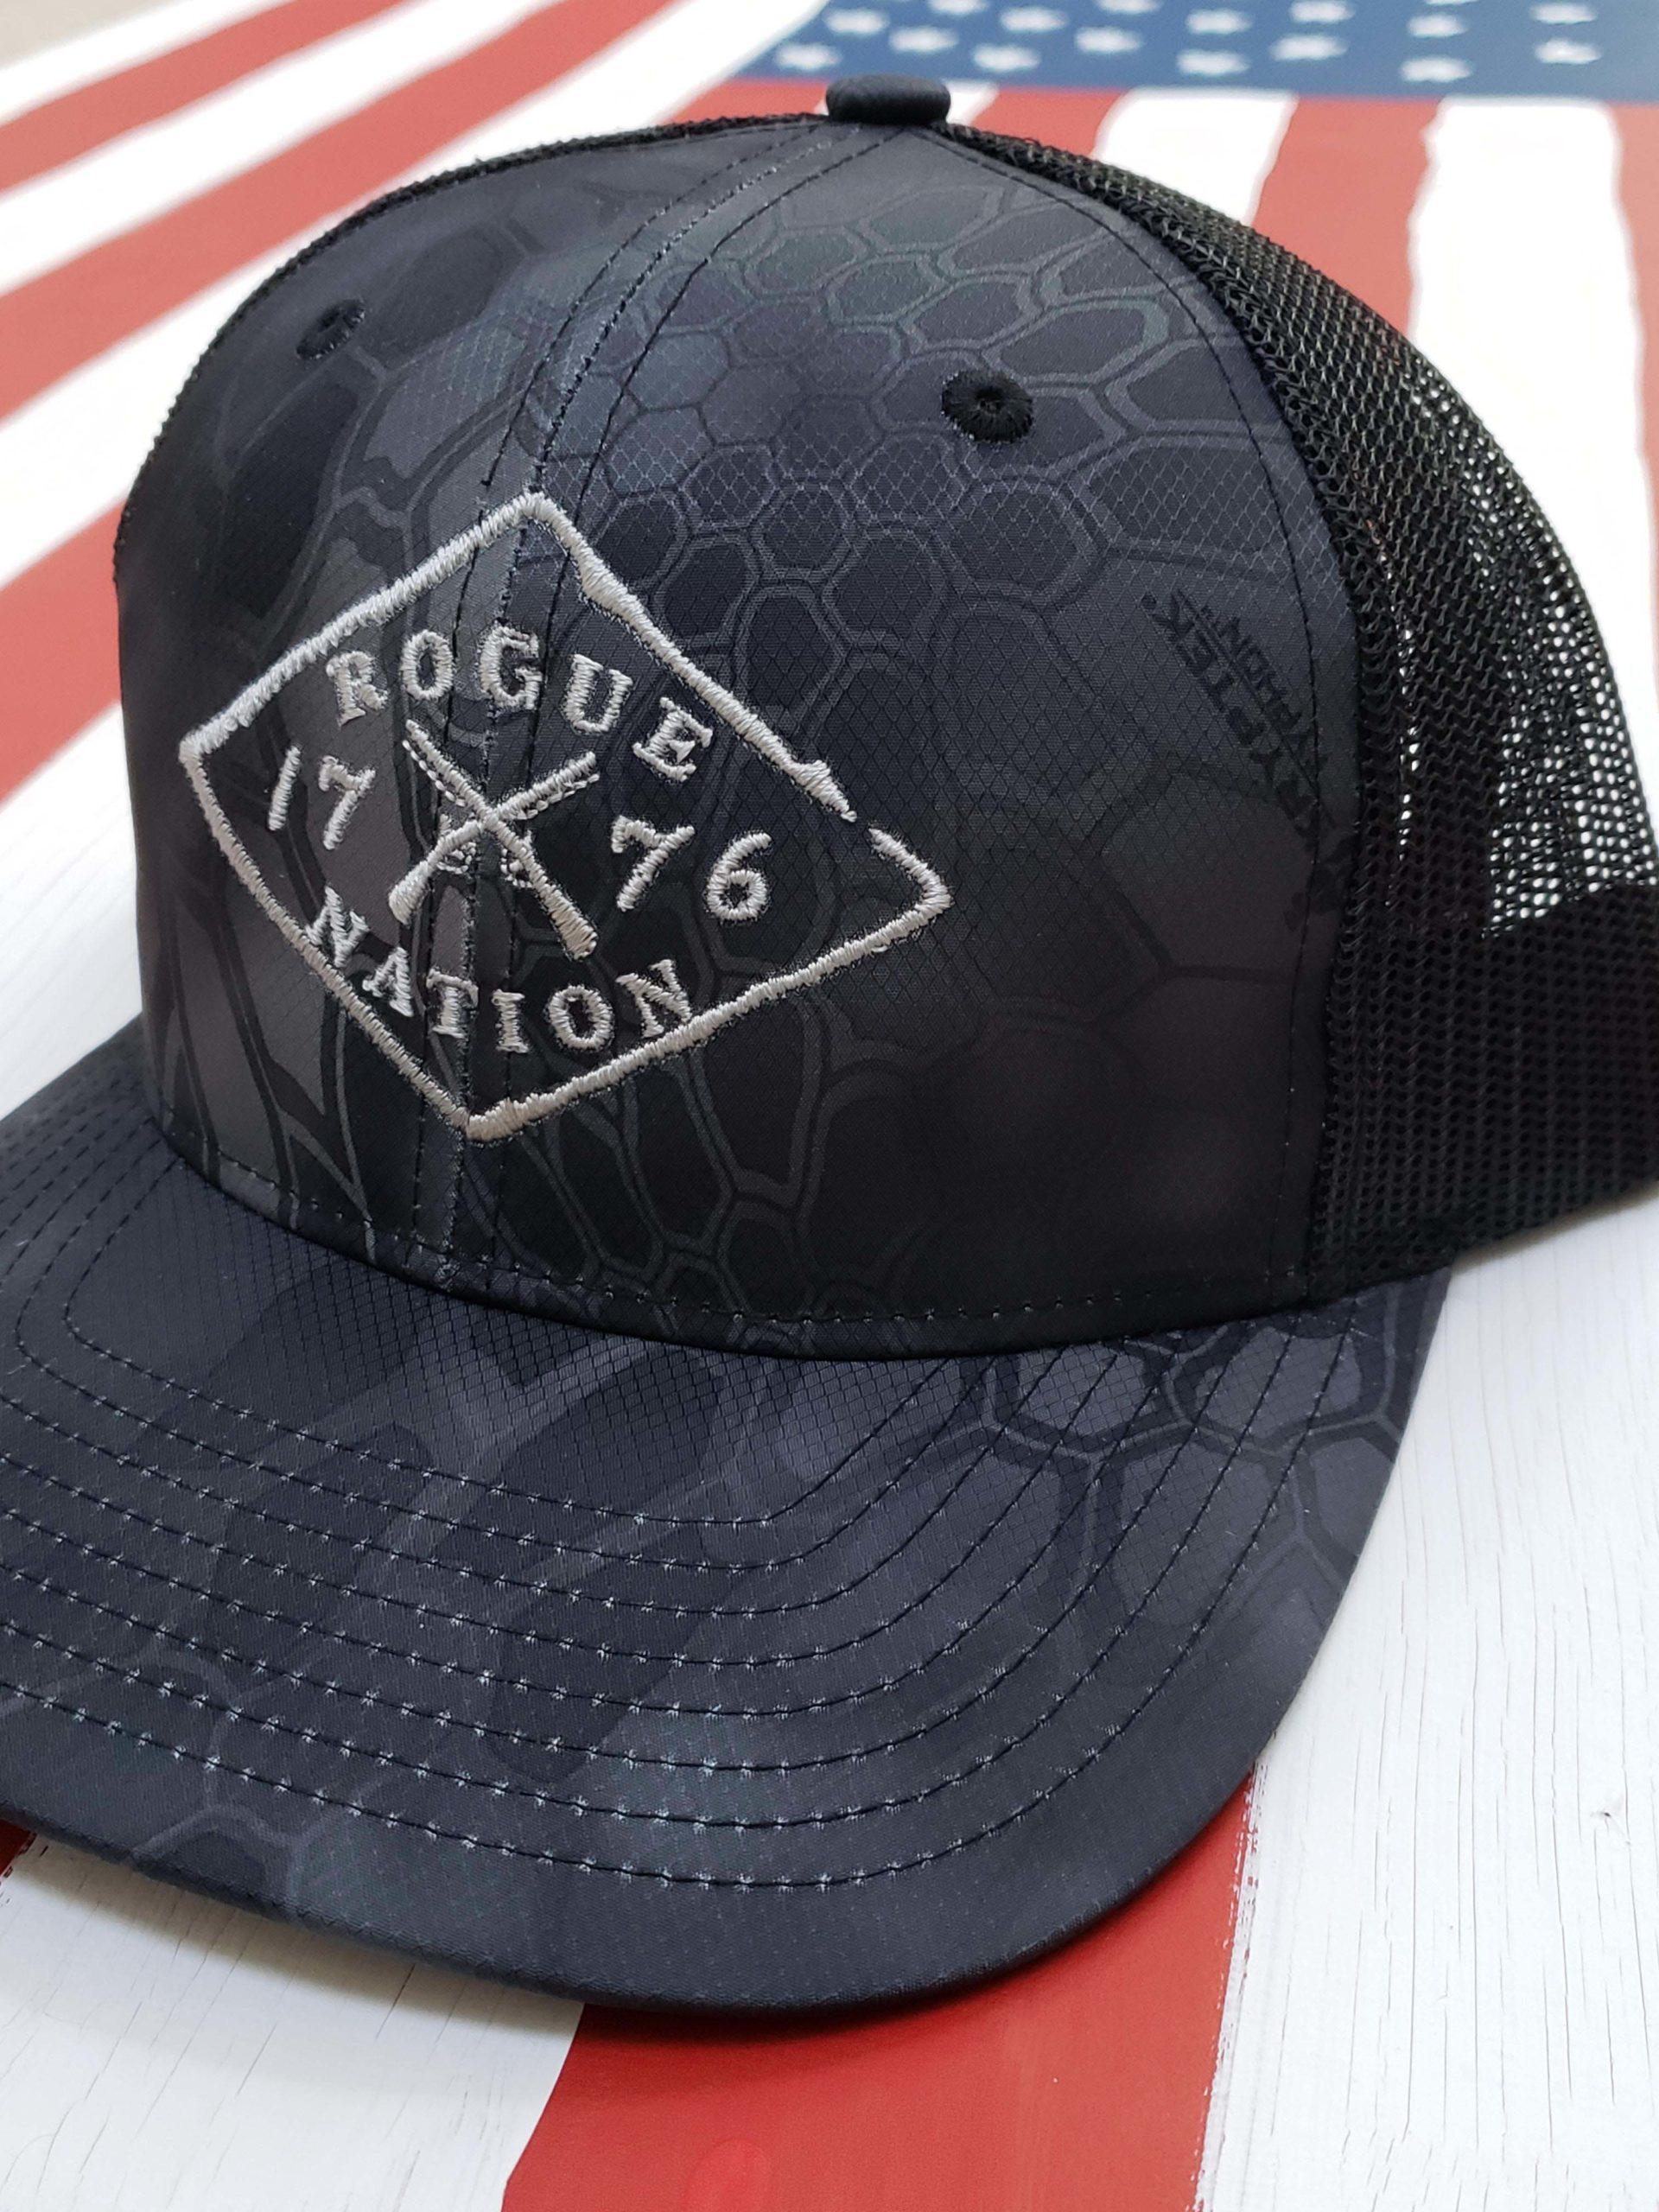 Richardson Kryptek Trucker Hat, Typhon